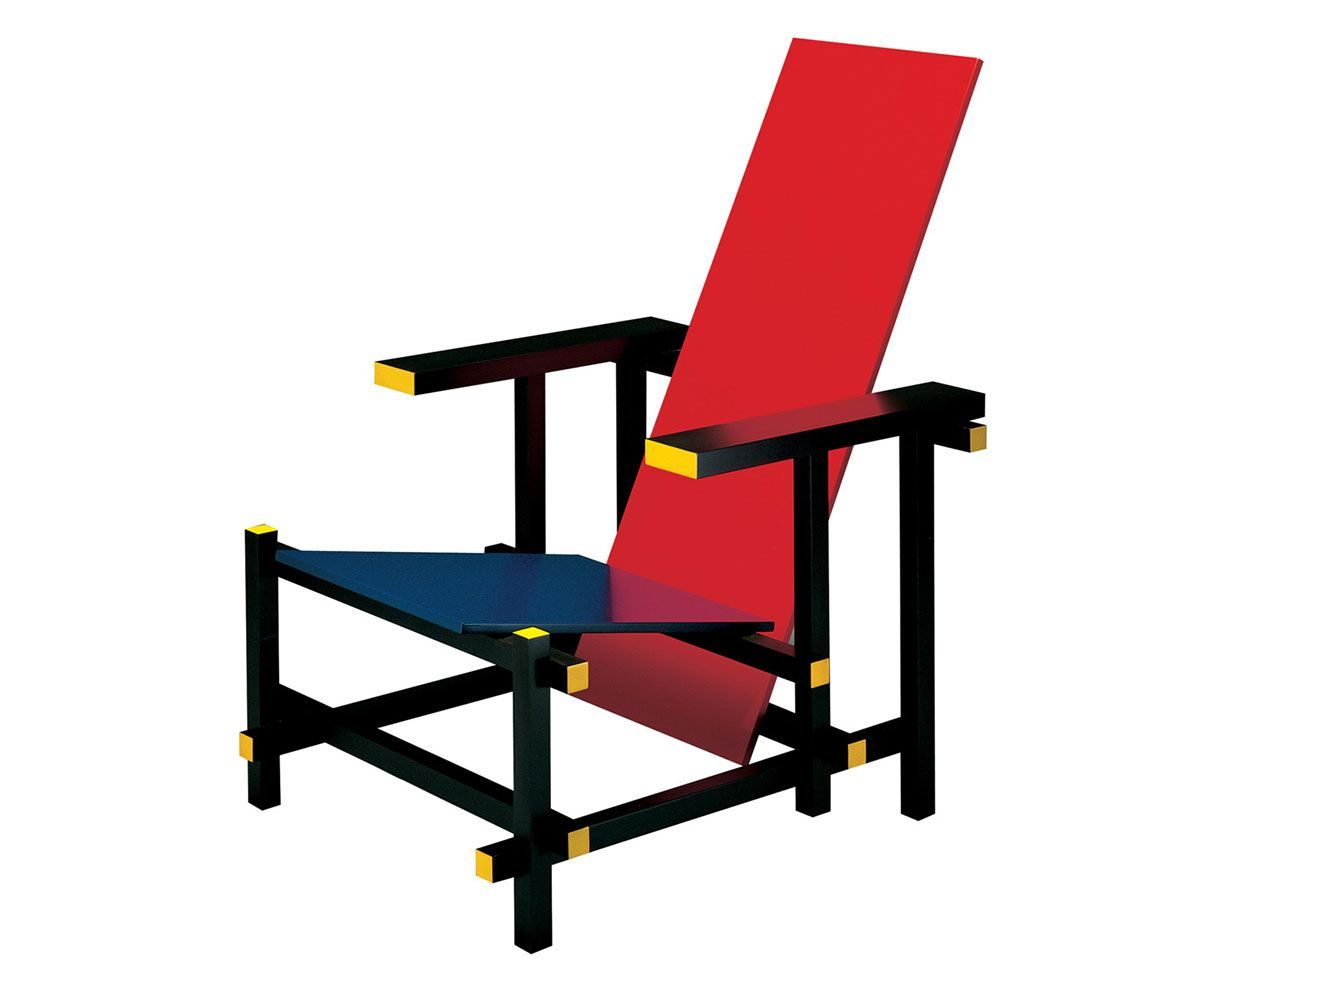 Rood Blauwe Stoel : Gerrit rietveld rood blauwe stoel  vakdidactiek